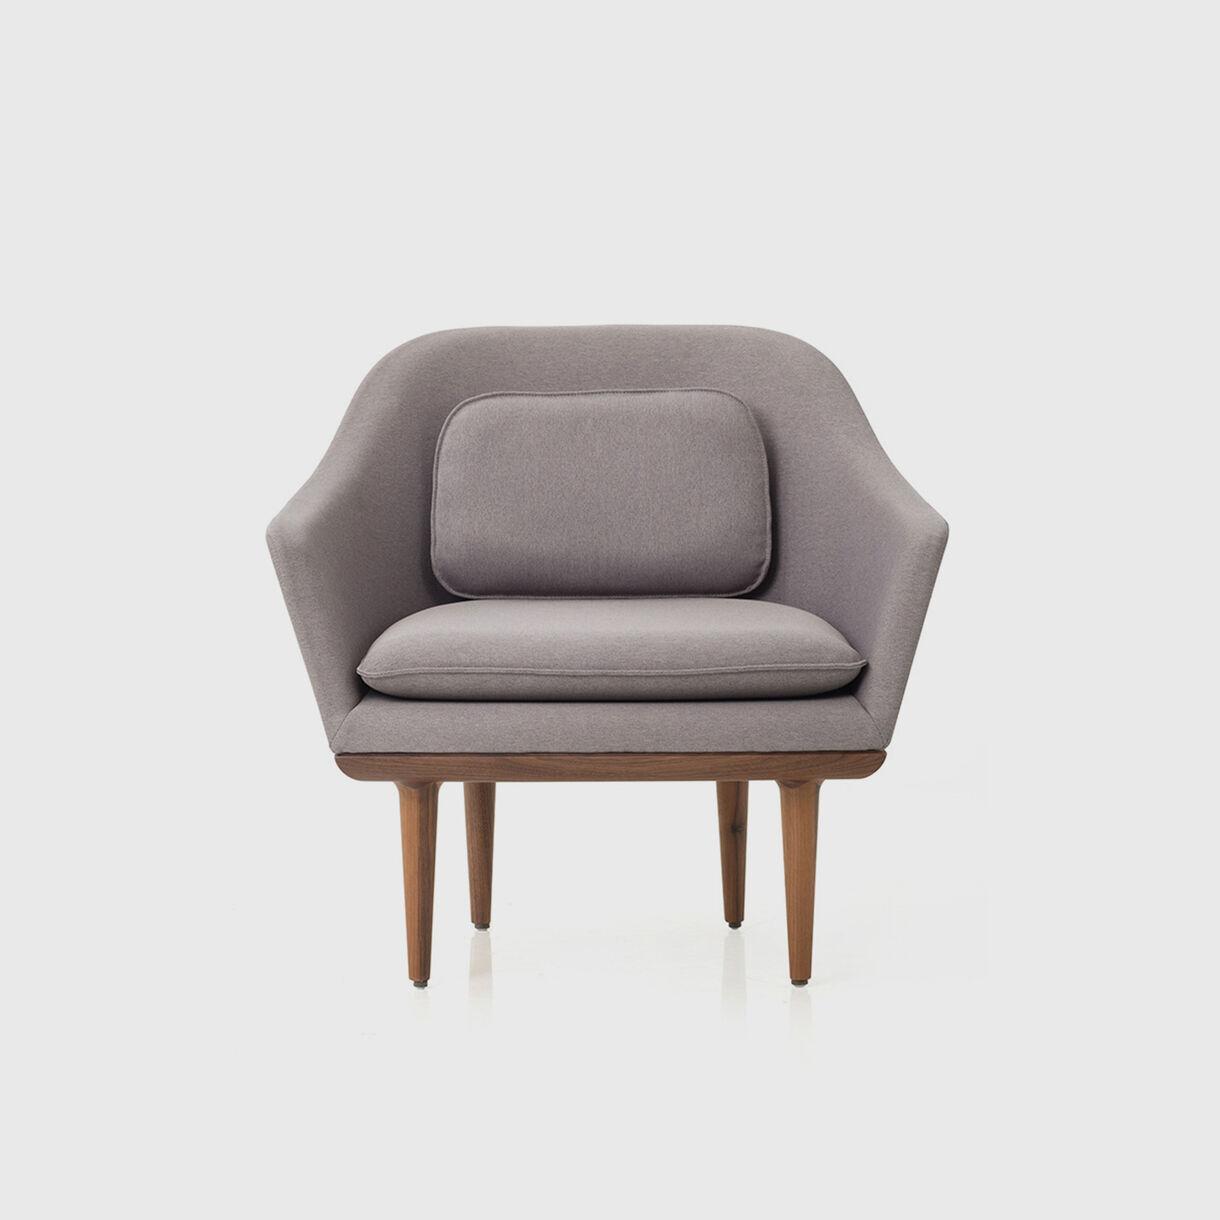 Lunar Lounge Chair, Large